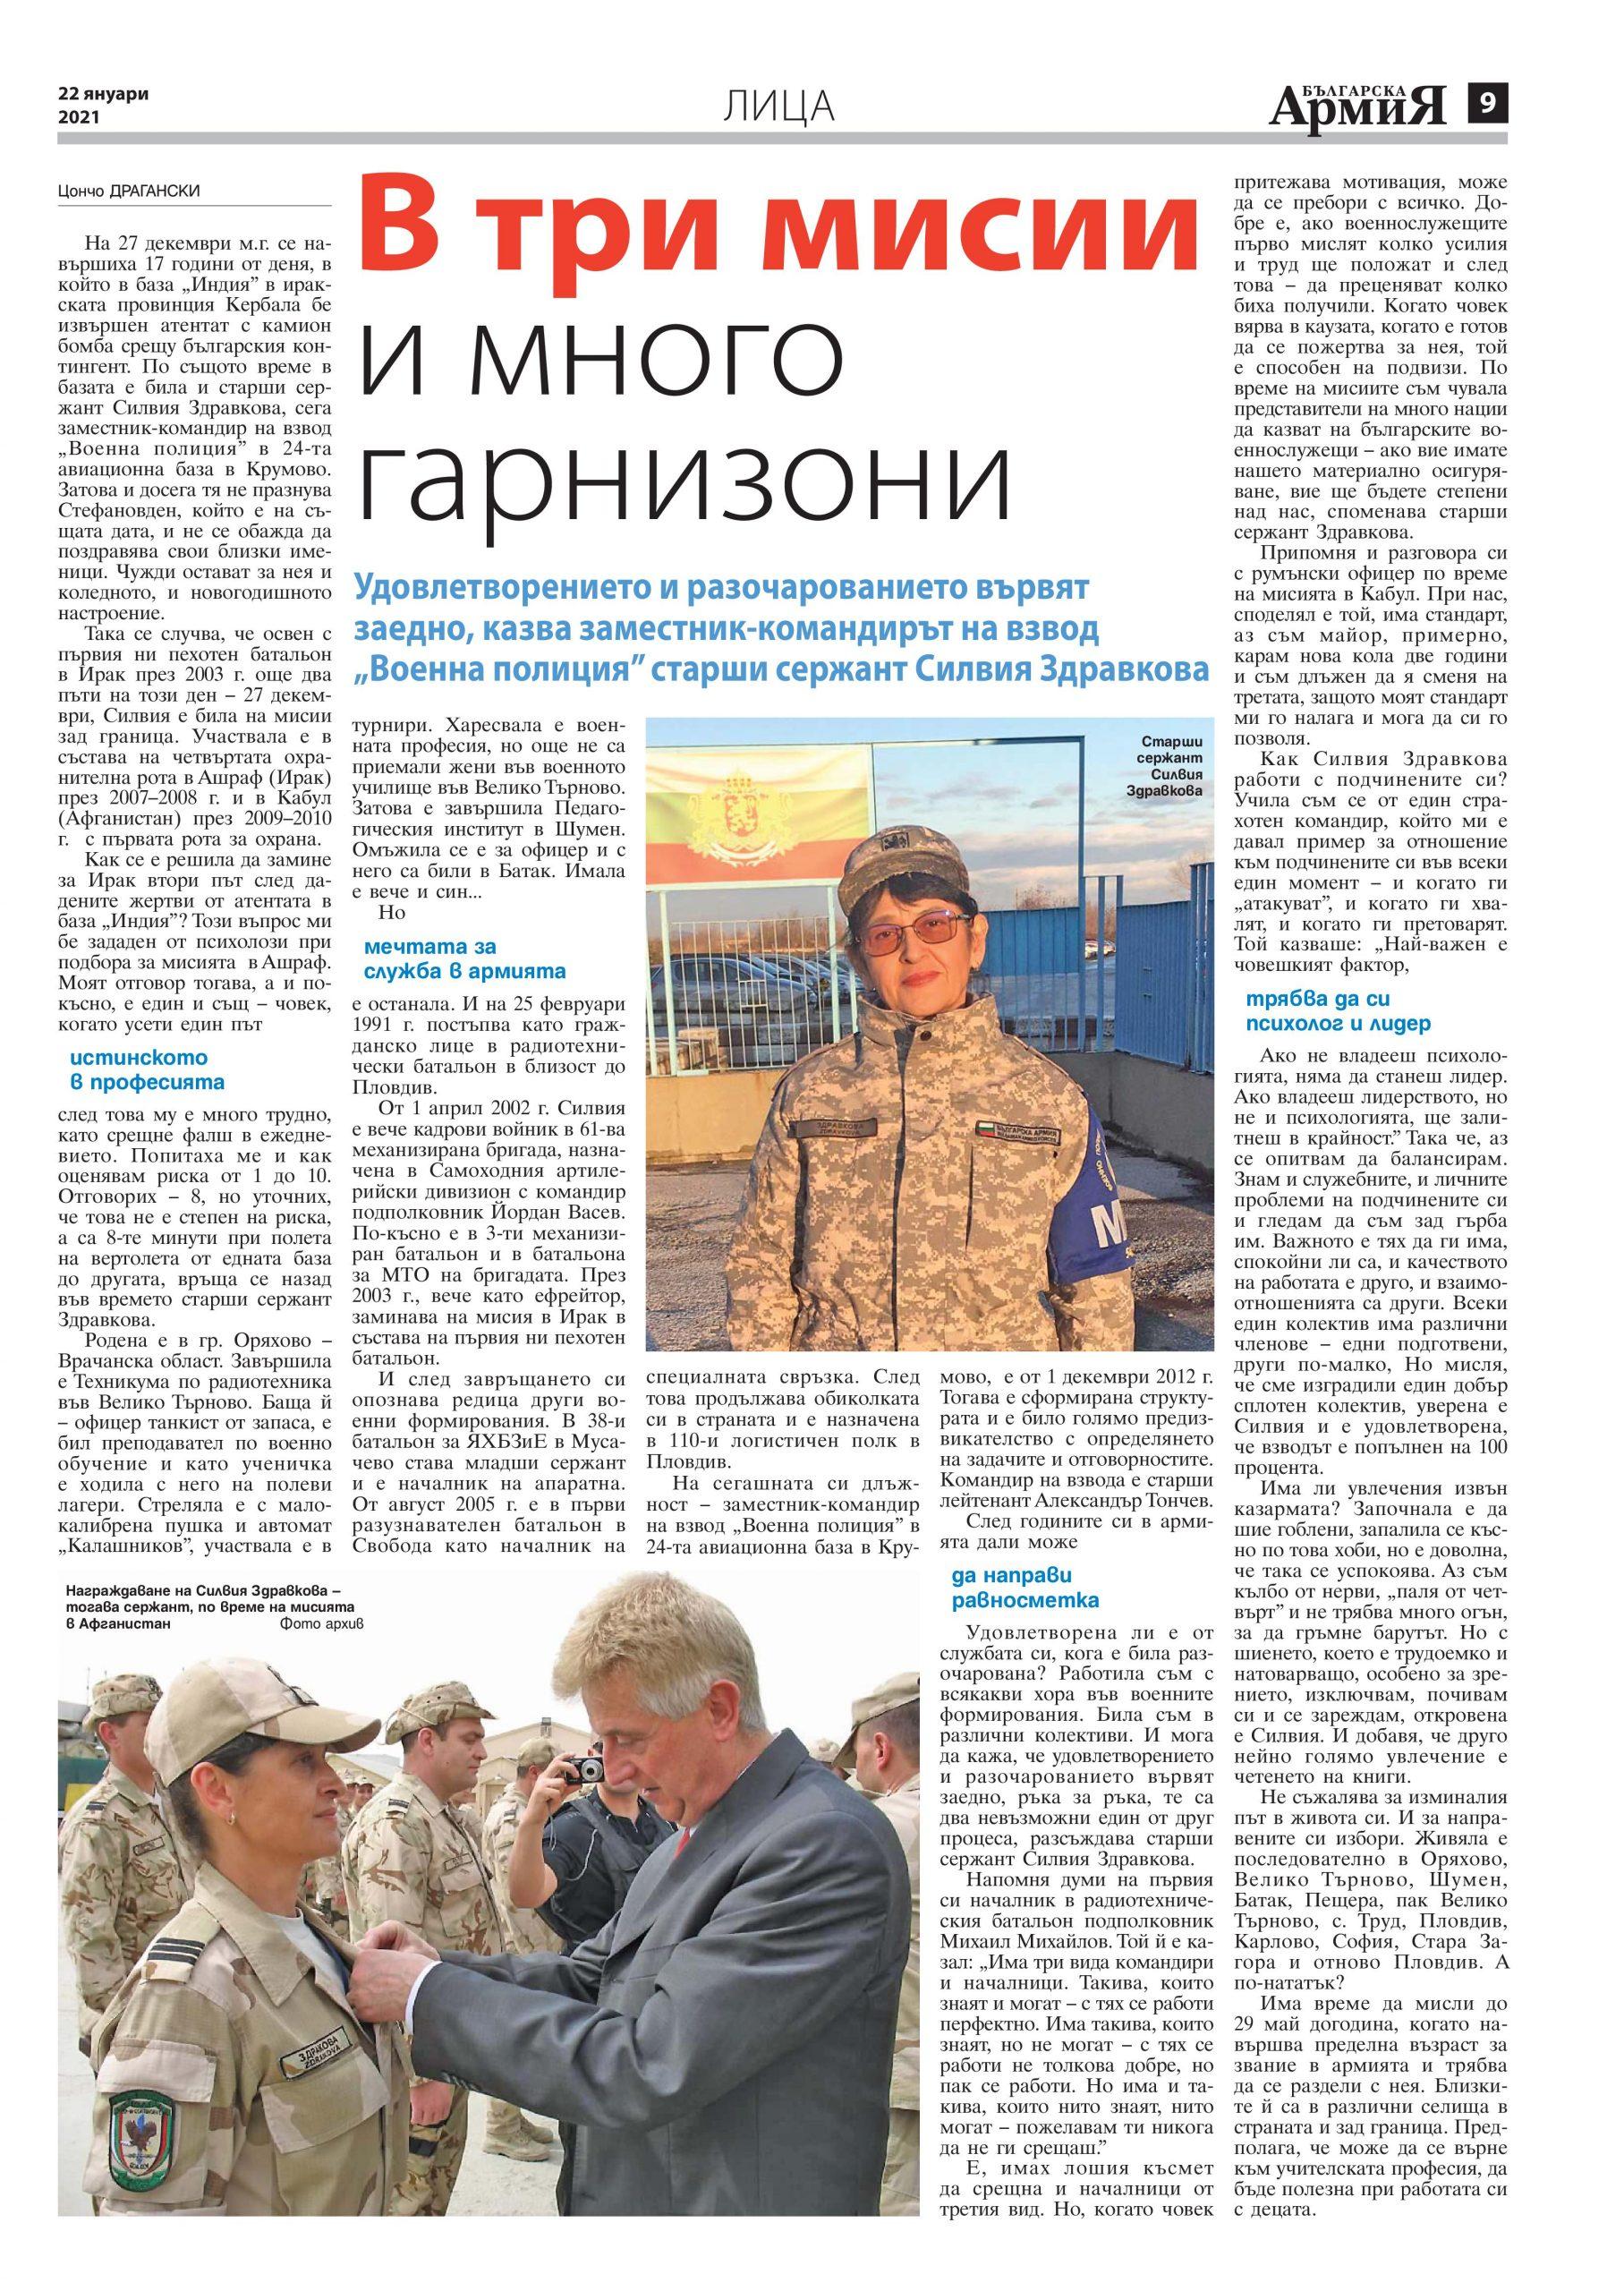 https://armymedia.bg/wp-content/uploads/2015/06/09-56-scaled.jpg